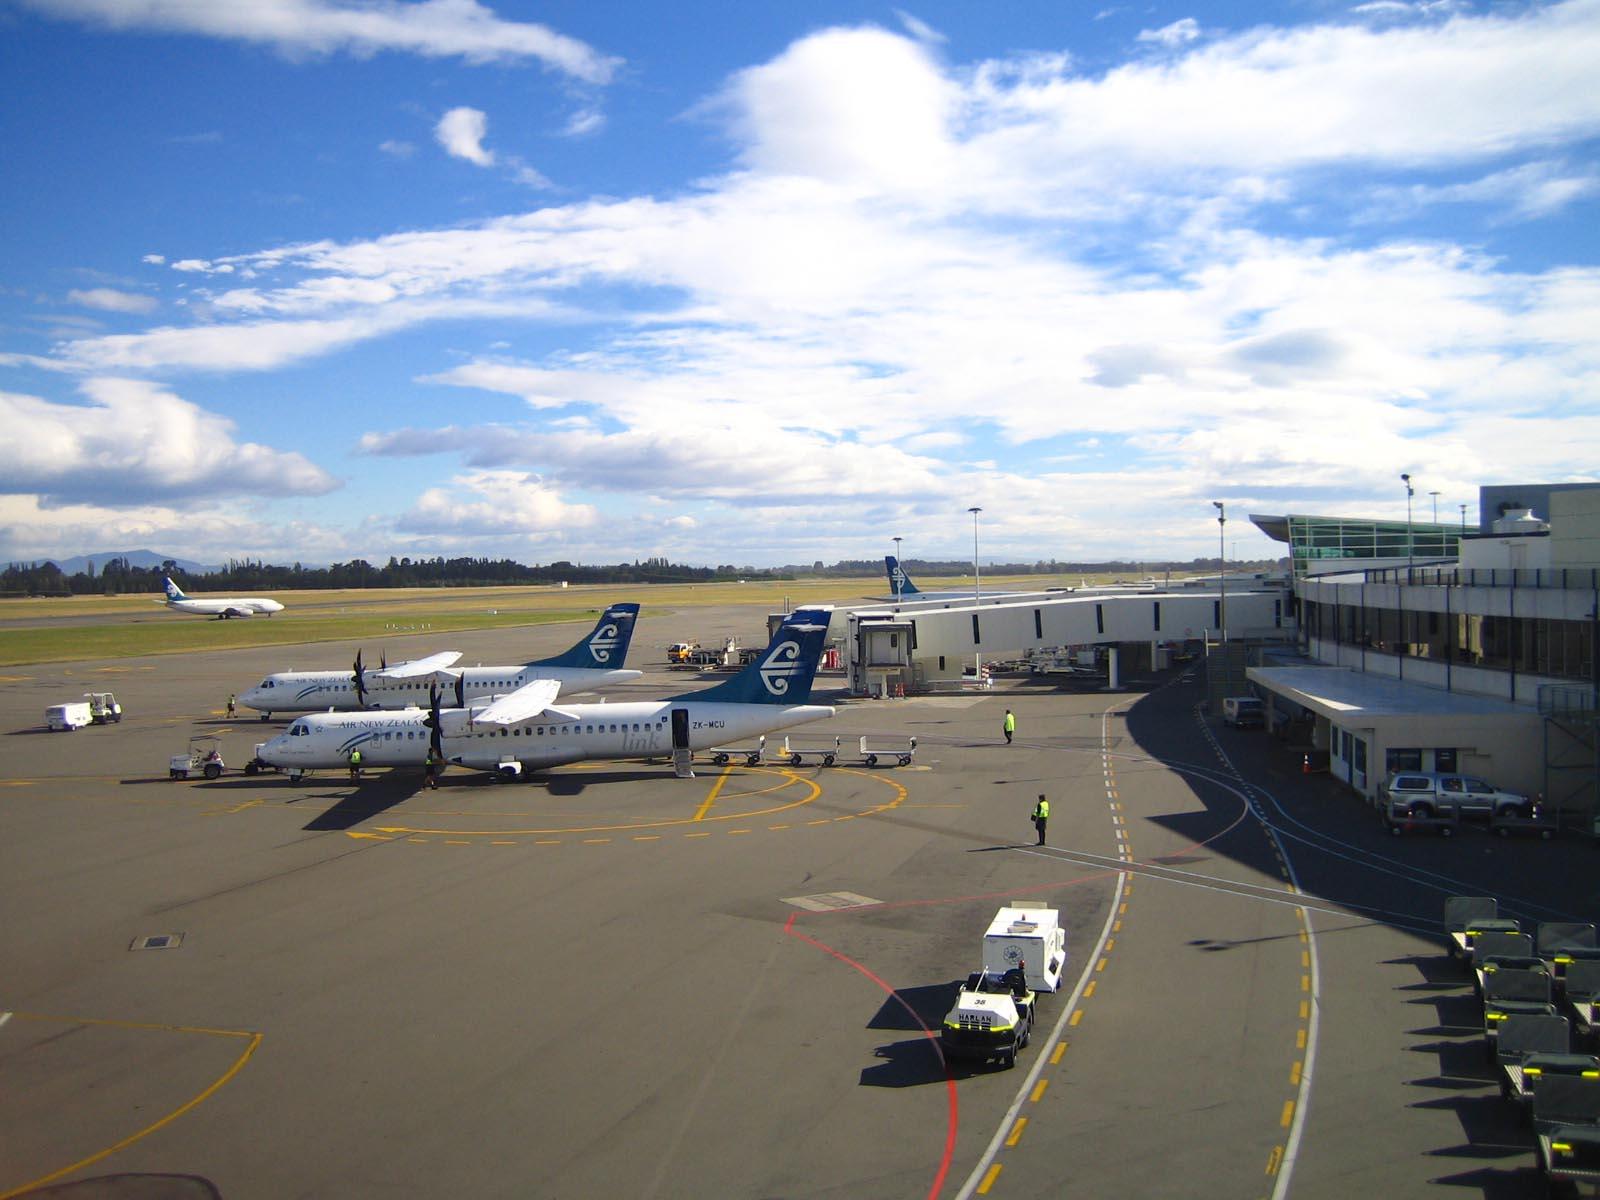 Depiction of Aeropuerto Internacional de Christchurch